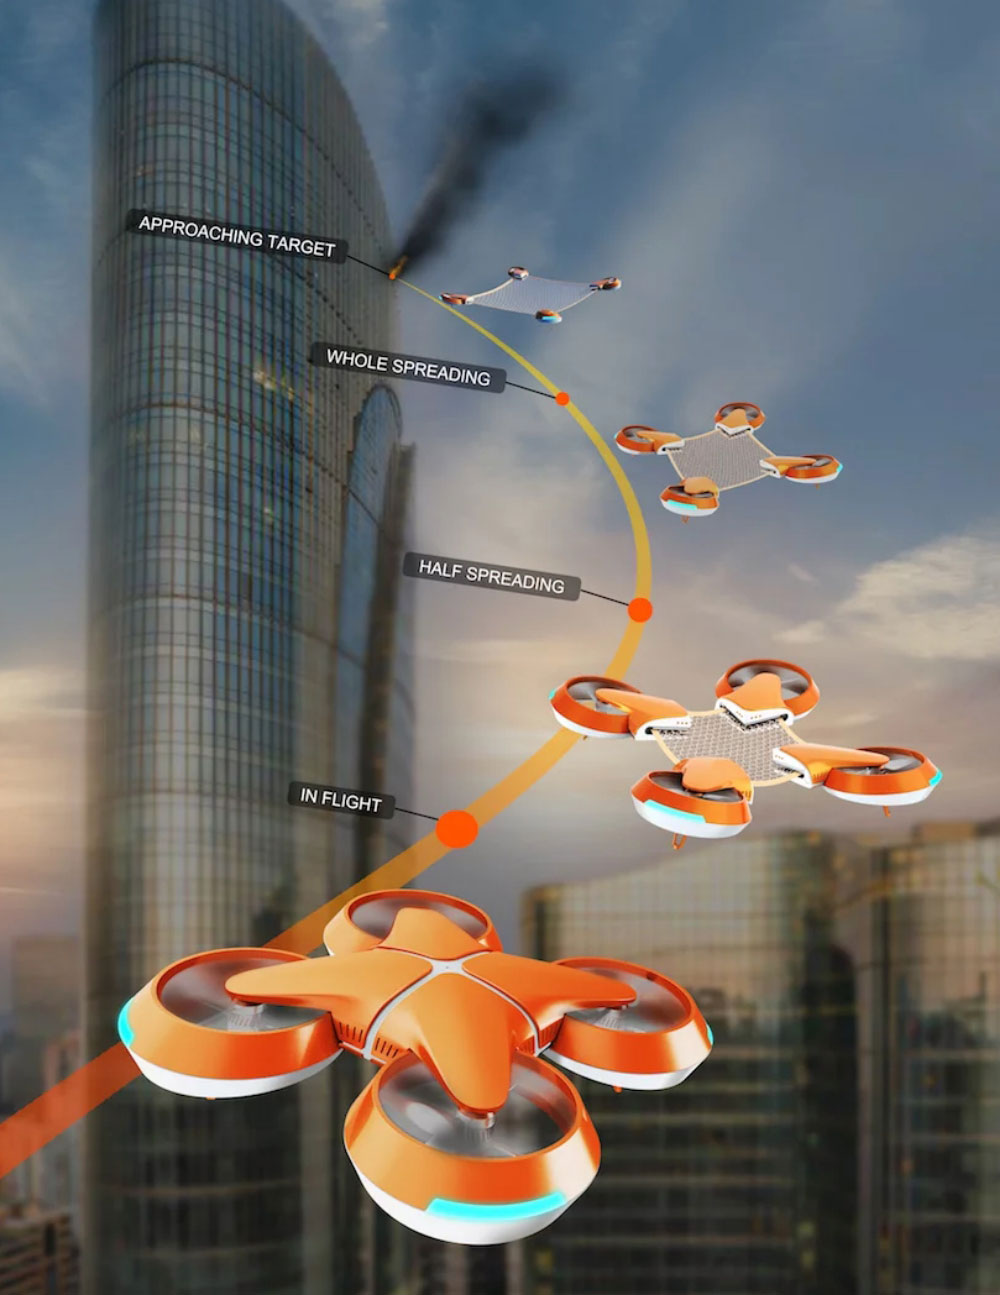 net_guard_drone_visual atelier 8_technology_future-4.jpg